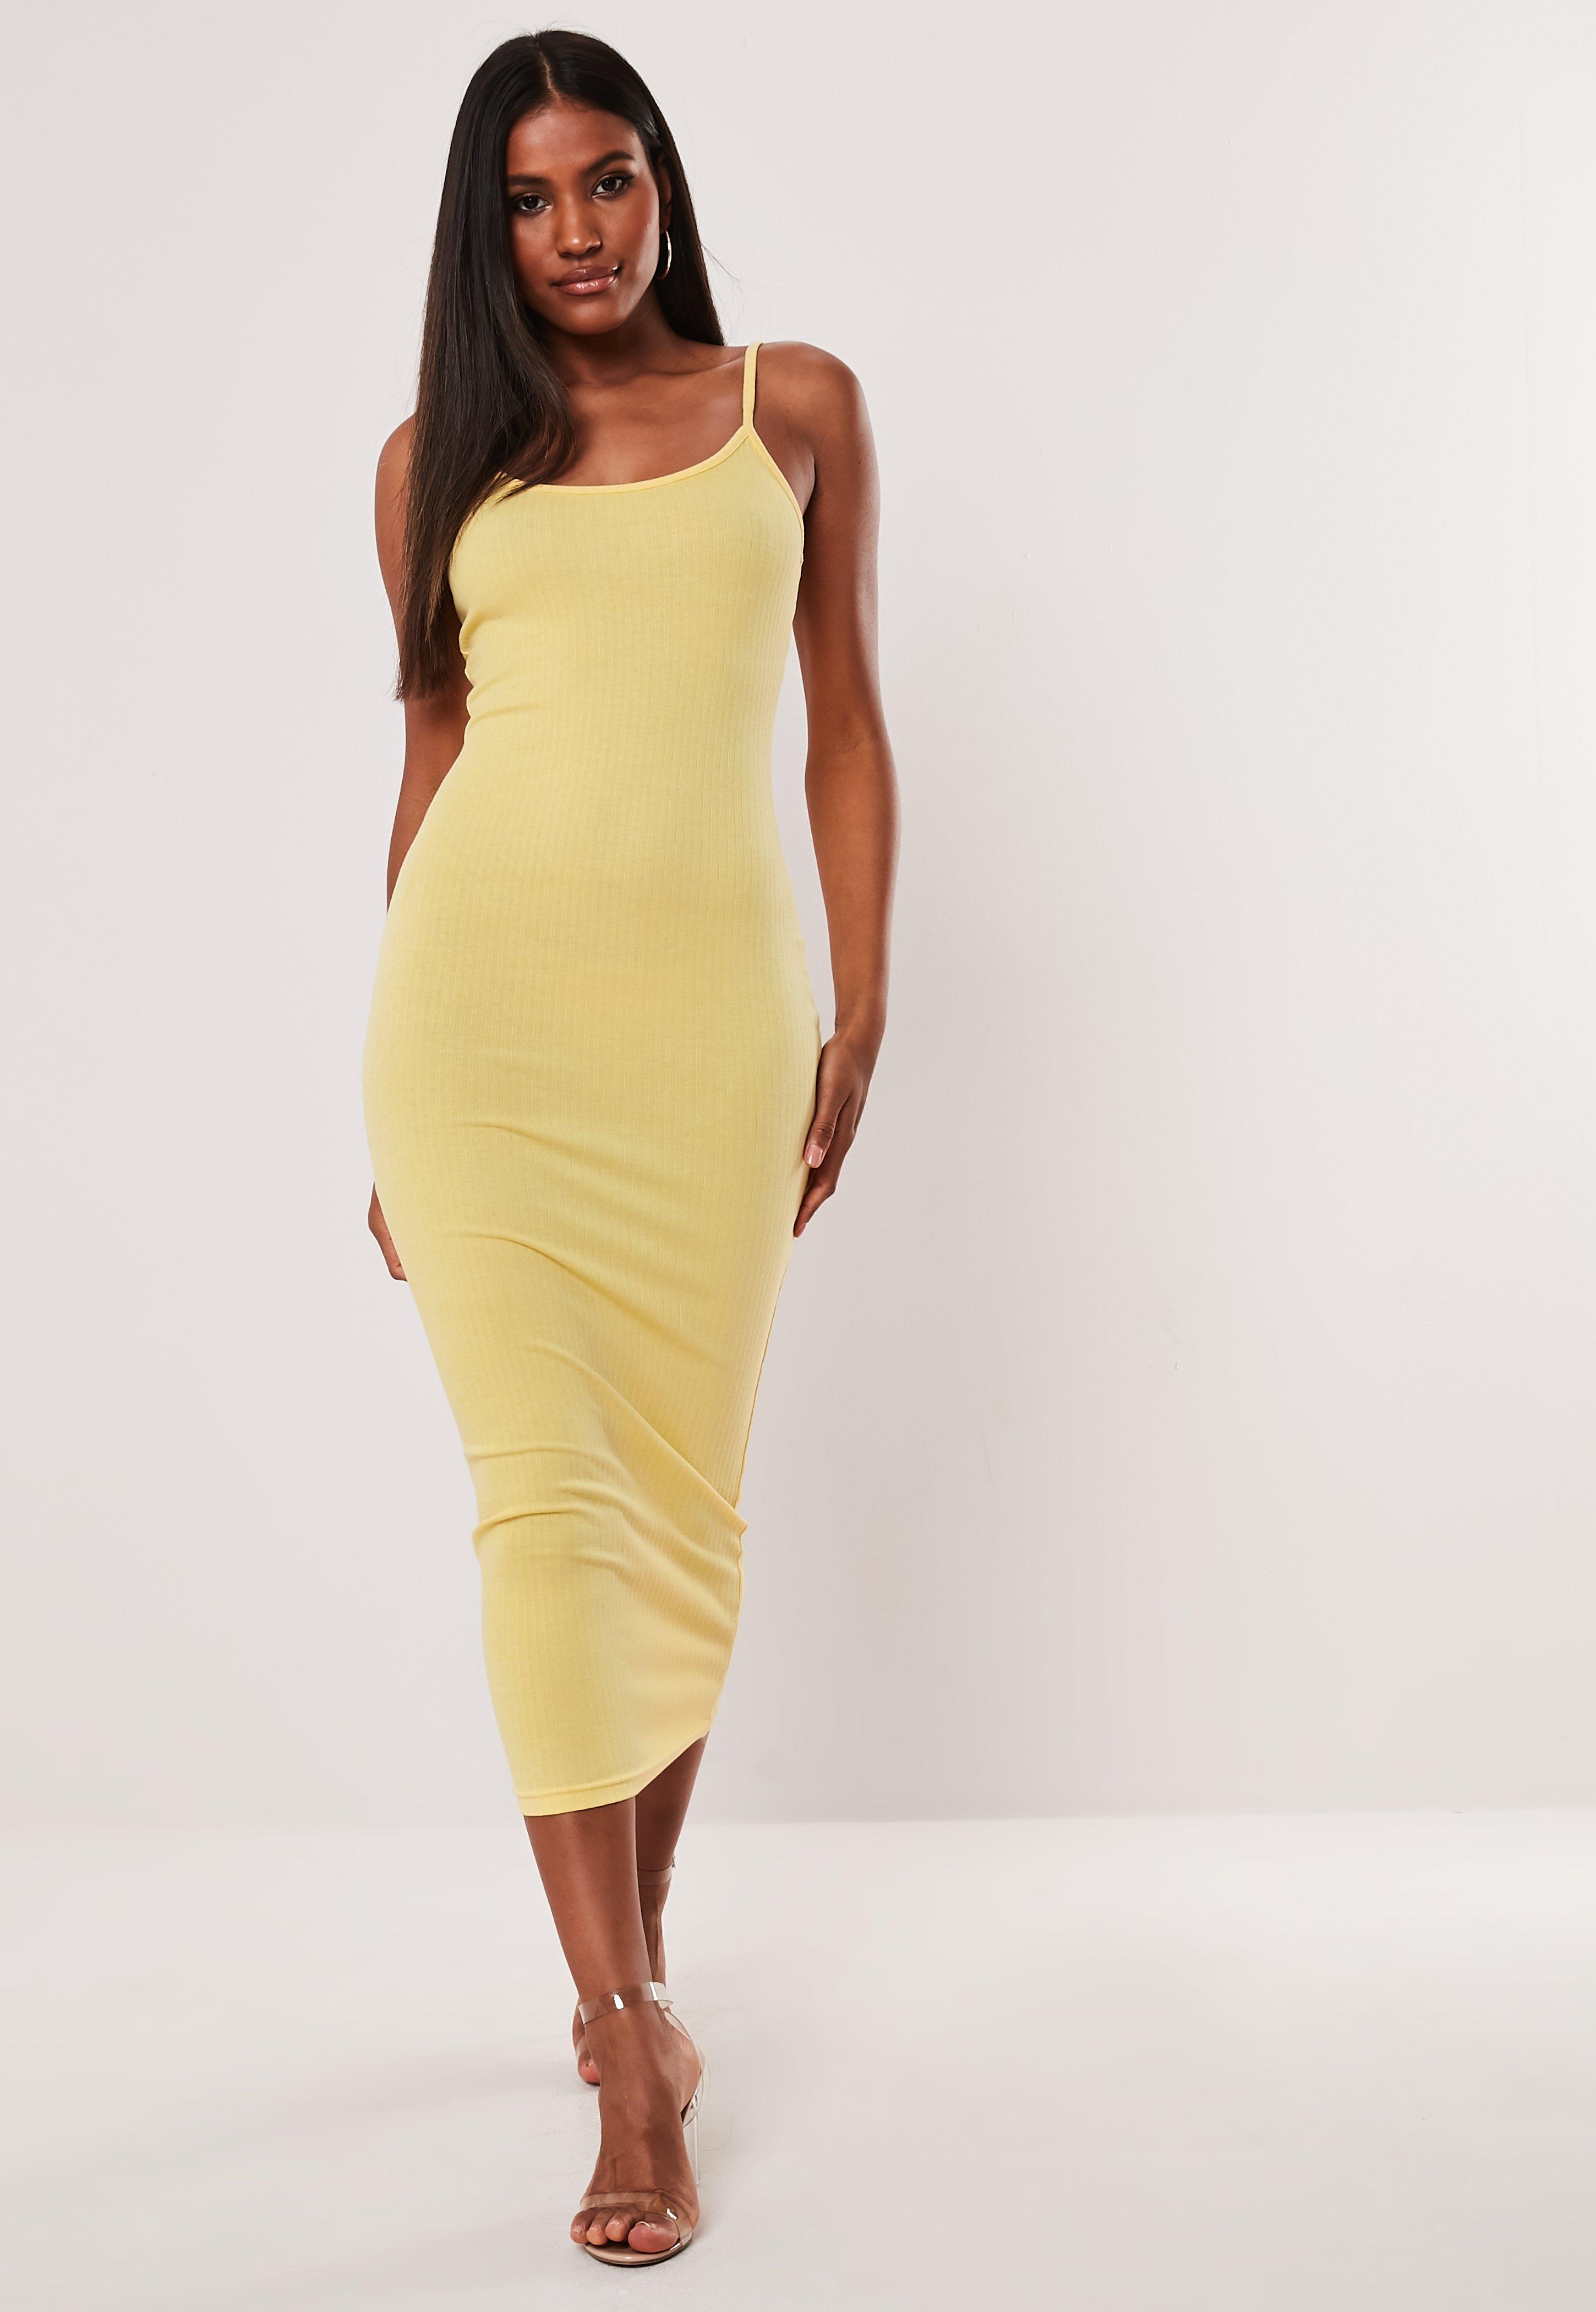 058063a7e4b6 Yellow Midi Dresses   Women's Yellow Midi Dresses Online - Missguided